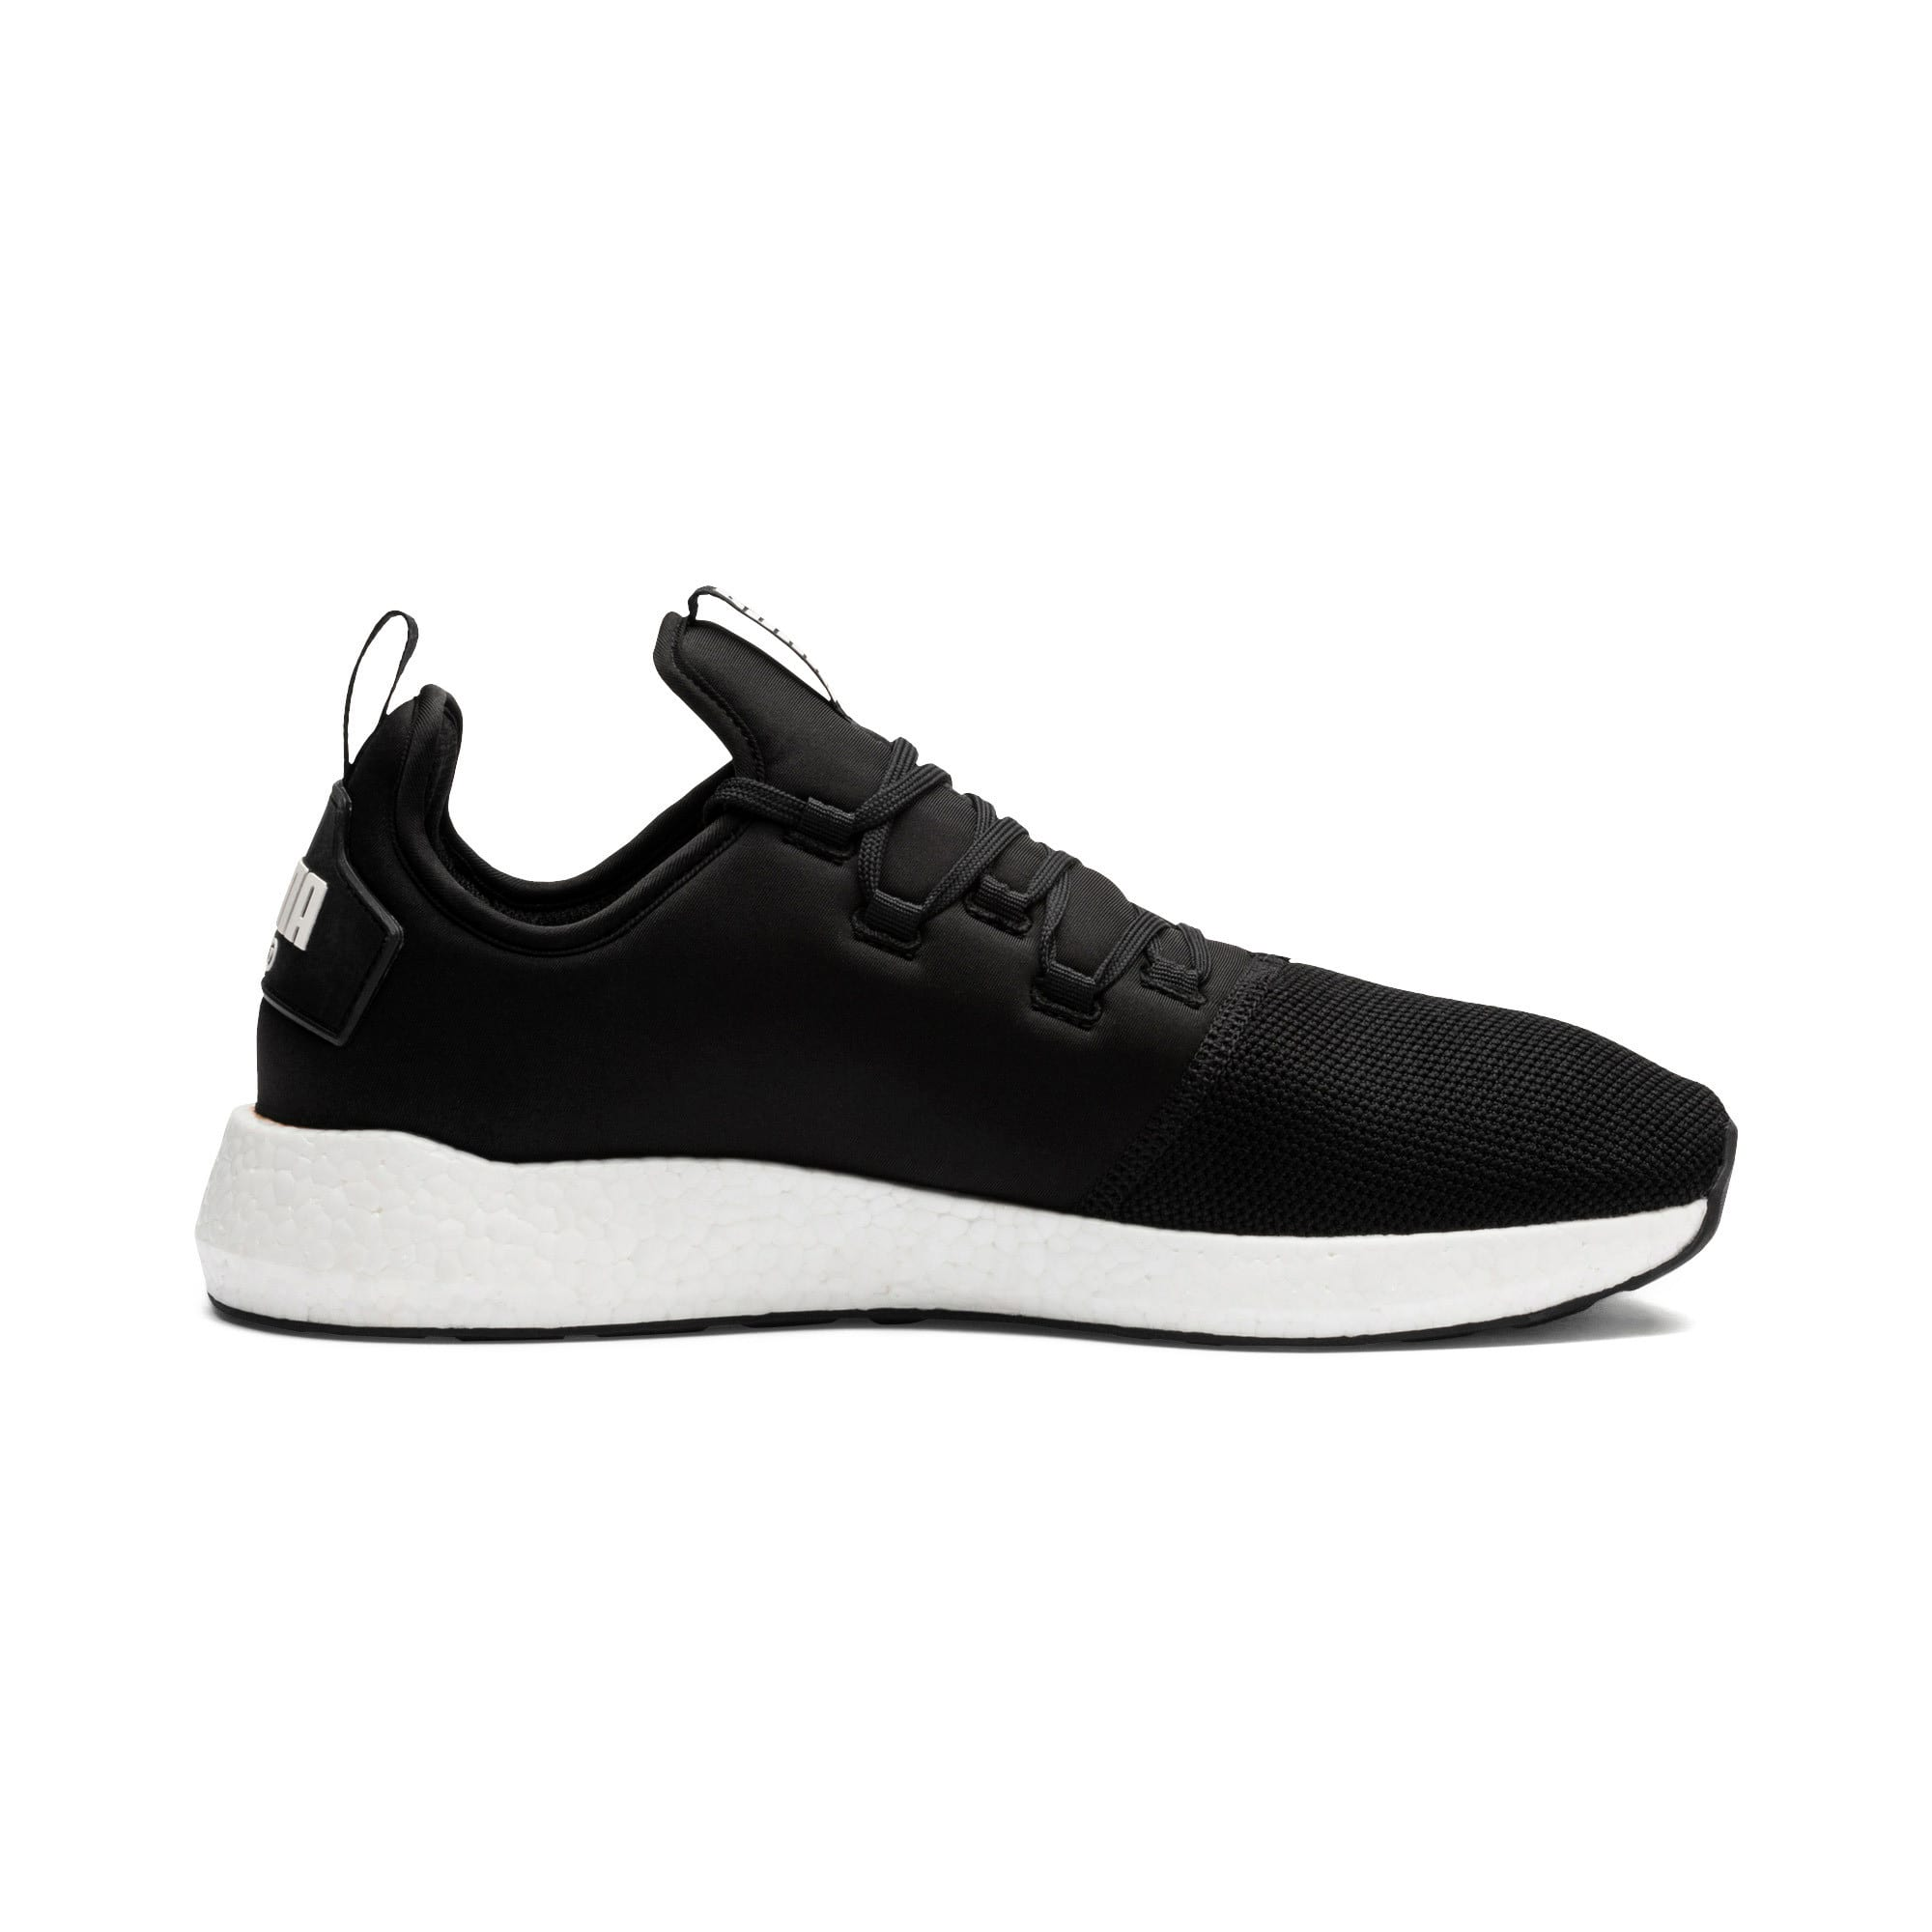 Thumbnail 5 of NRGY Neko Men's Running Shoes, Puma Black-Puma White, medium